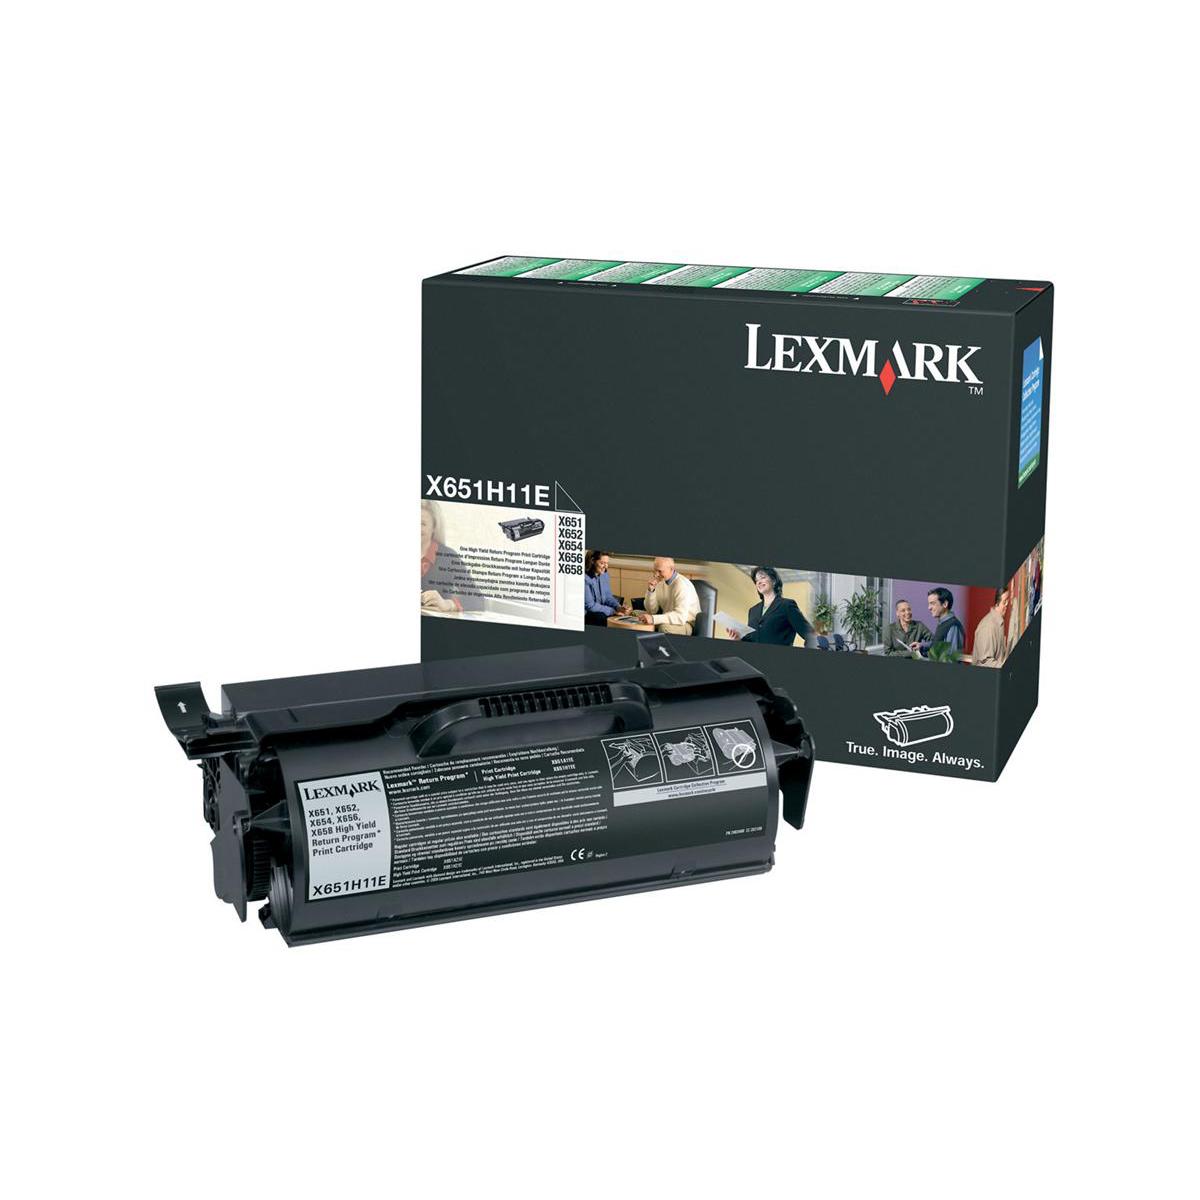 Lexmark Laser Toner Cartridge Return Program High Yield Page Life 25000pp Black Ref X651H11E